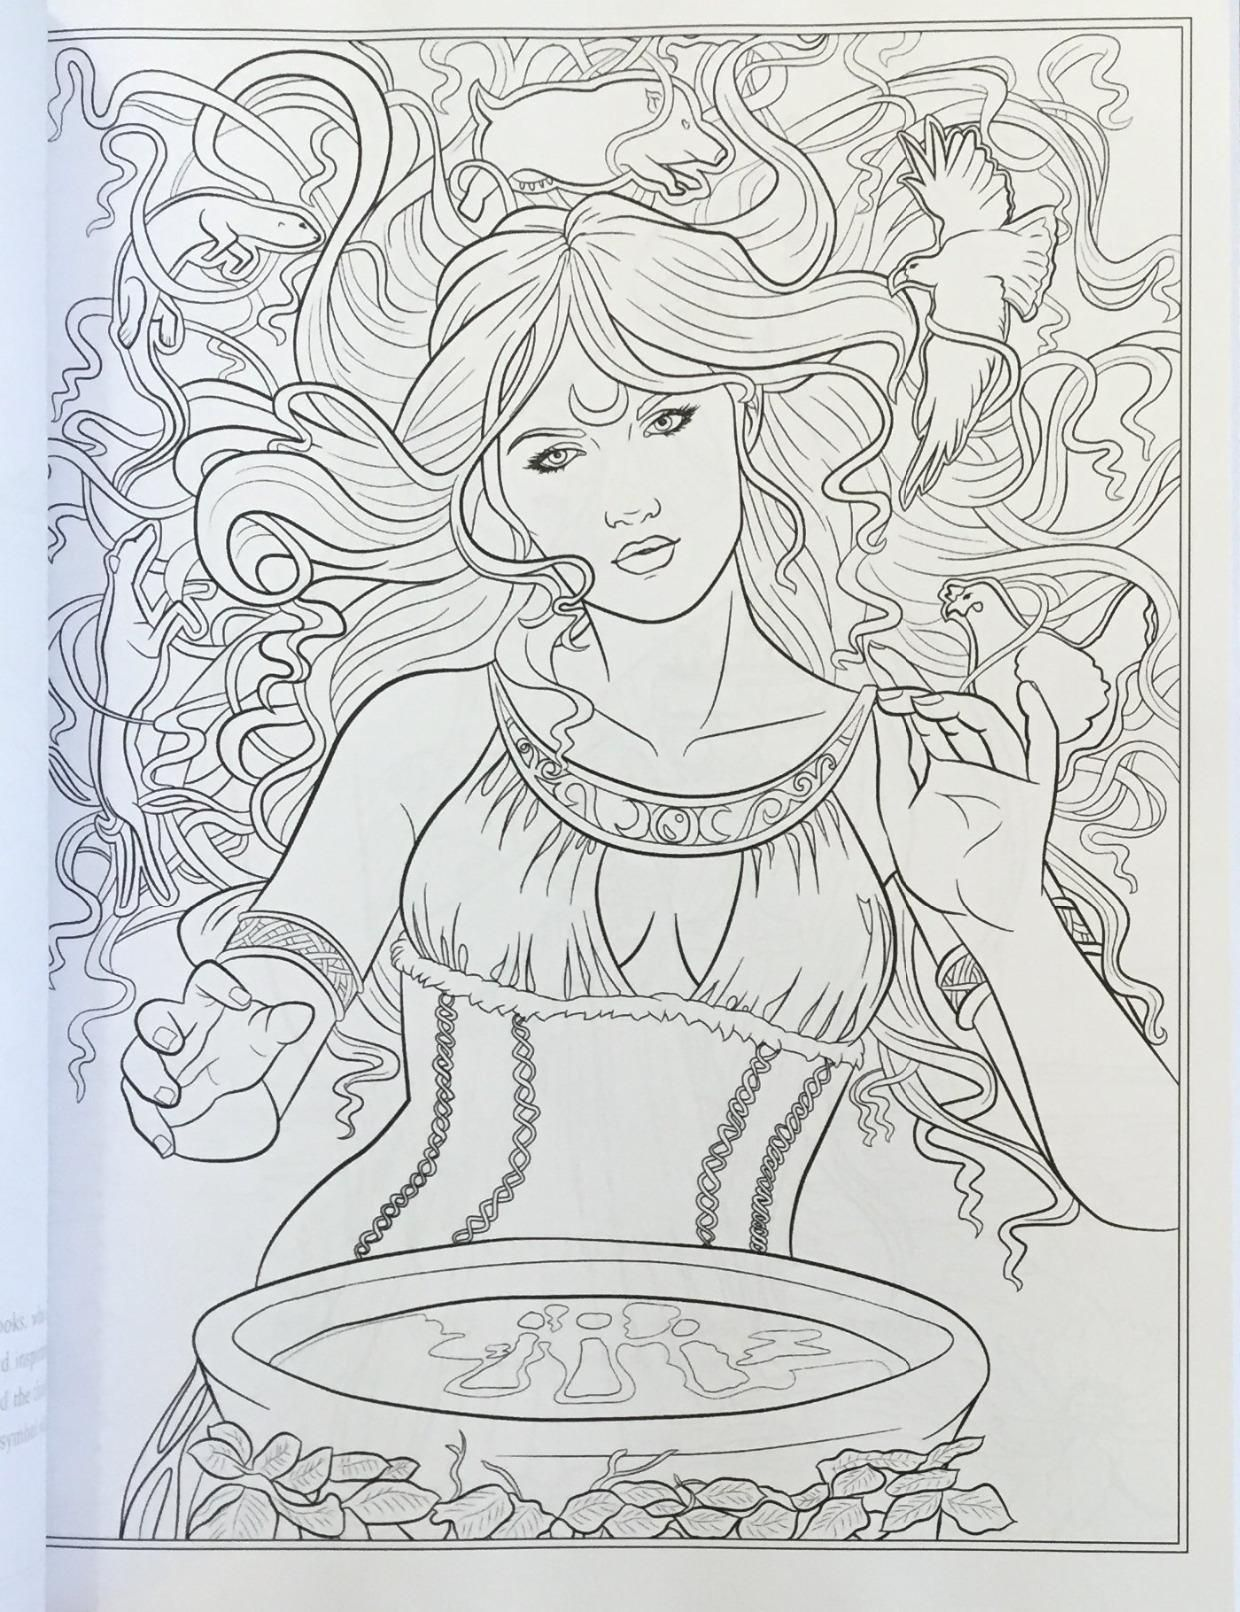 Goddess And Mythology Coloring Book (fantasy